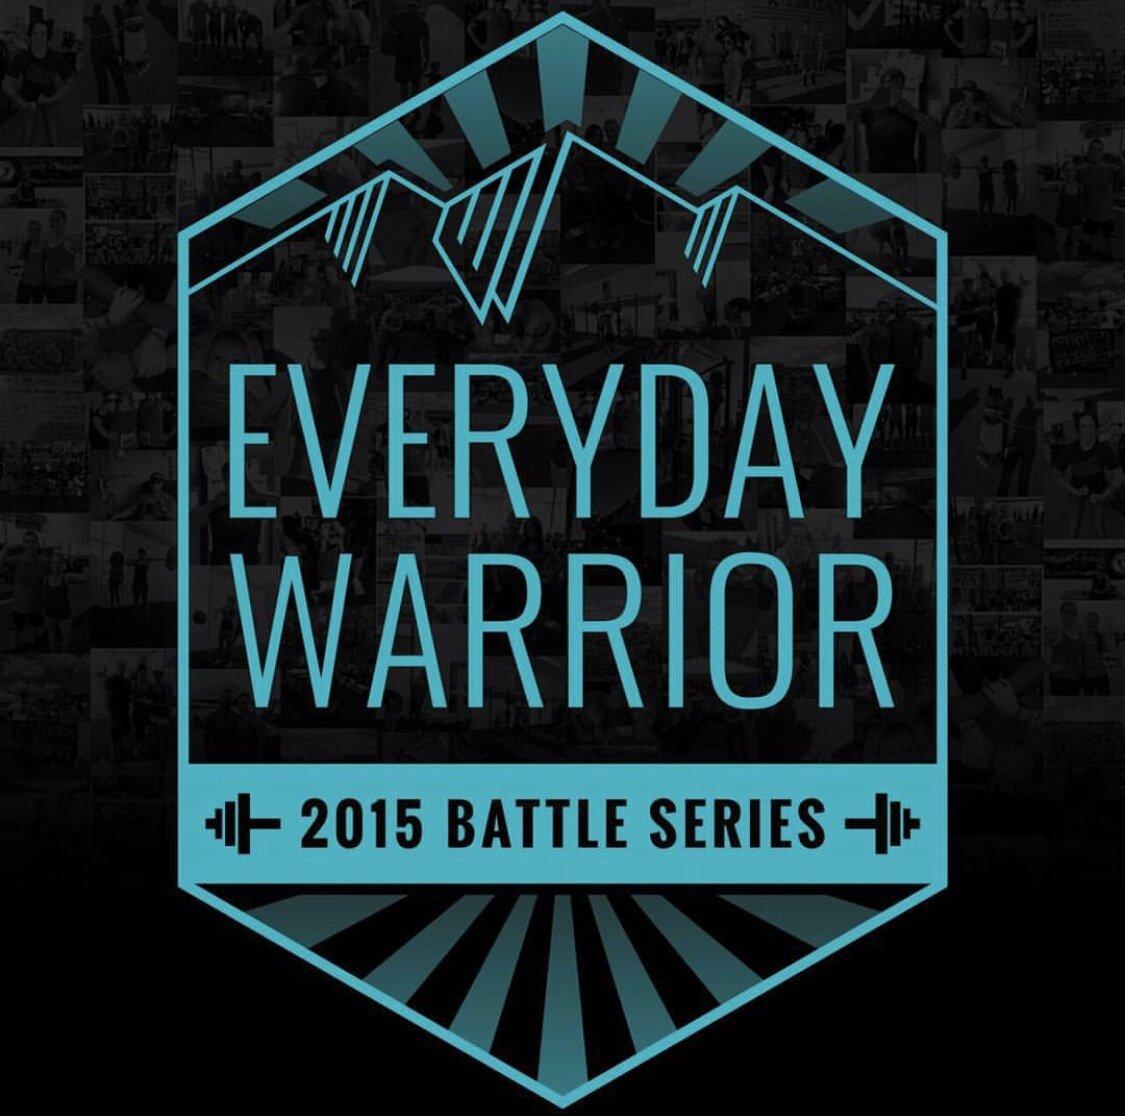 2015 Battle Series